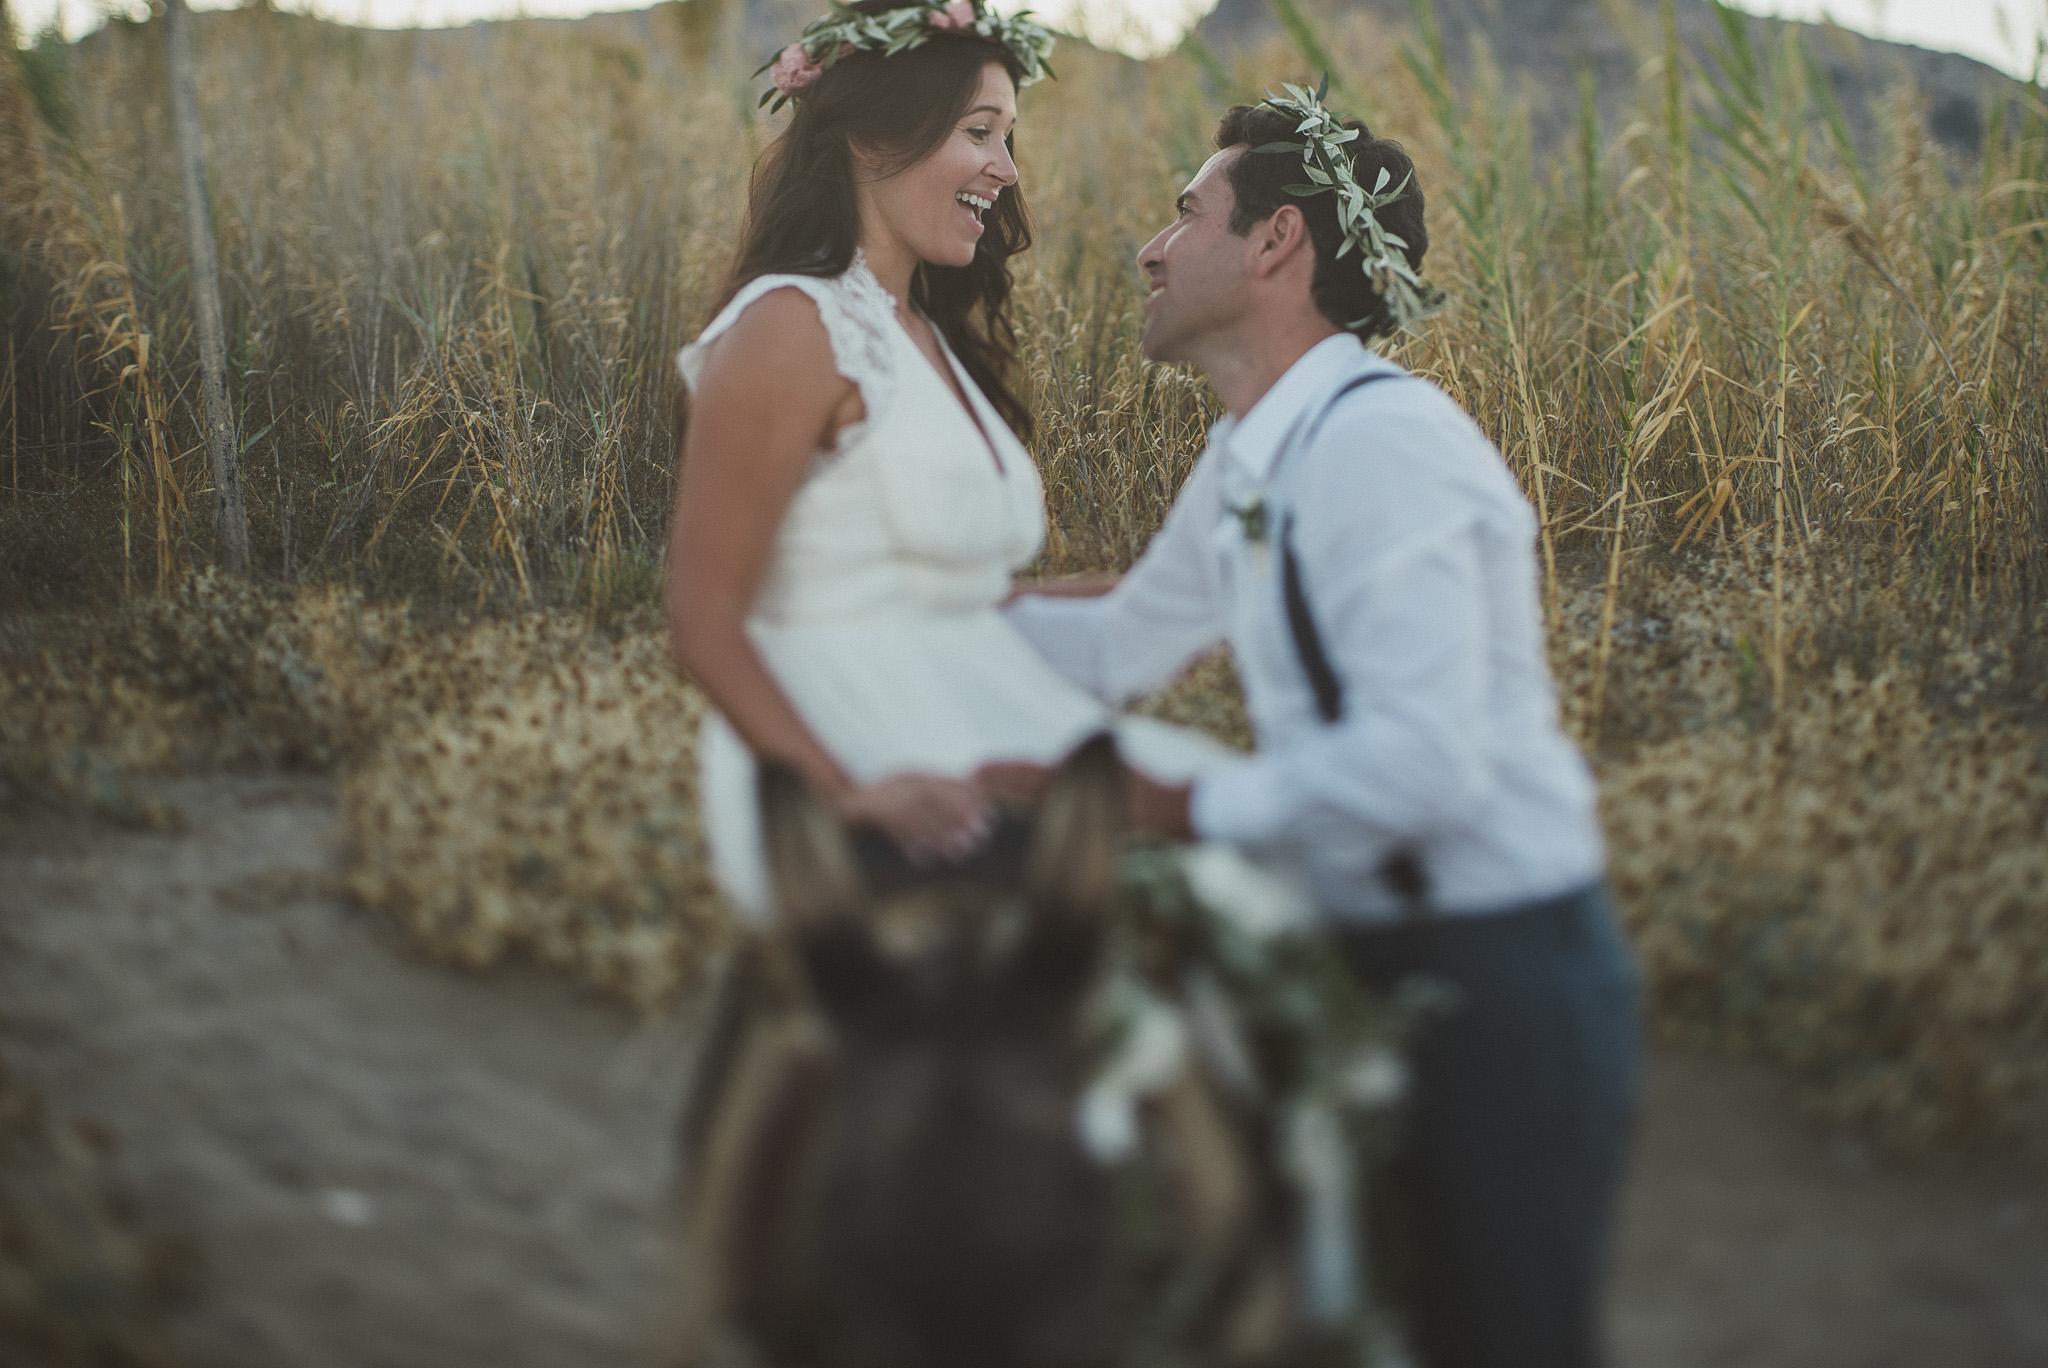 Donkey at traditional wedding